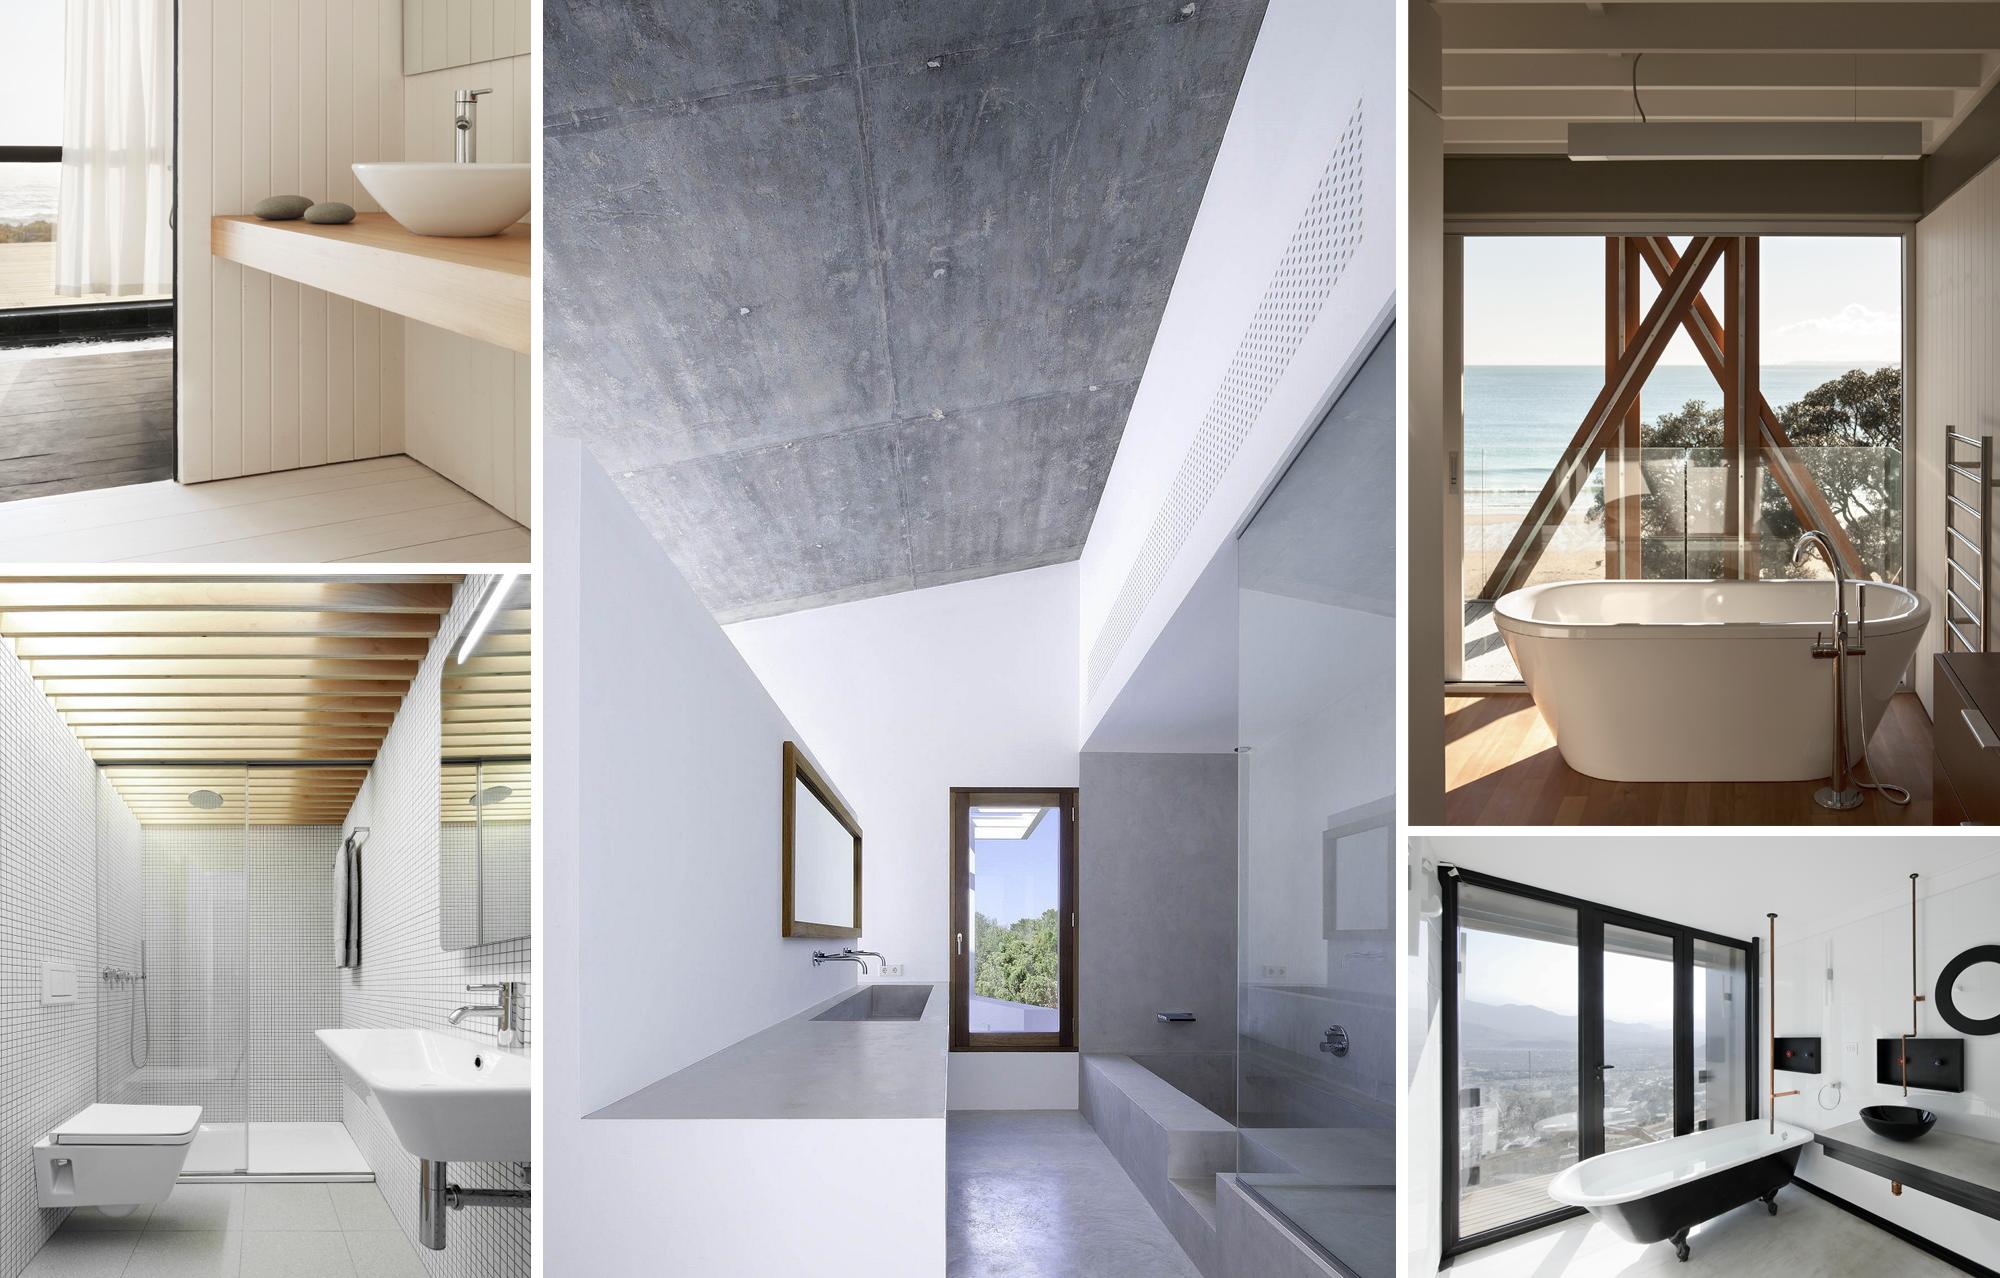 Ba os para viviendas arquitectura y ejemplos de dise o for Catalogo arquitectura